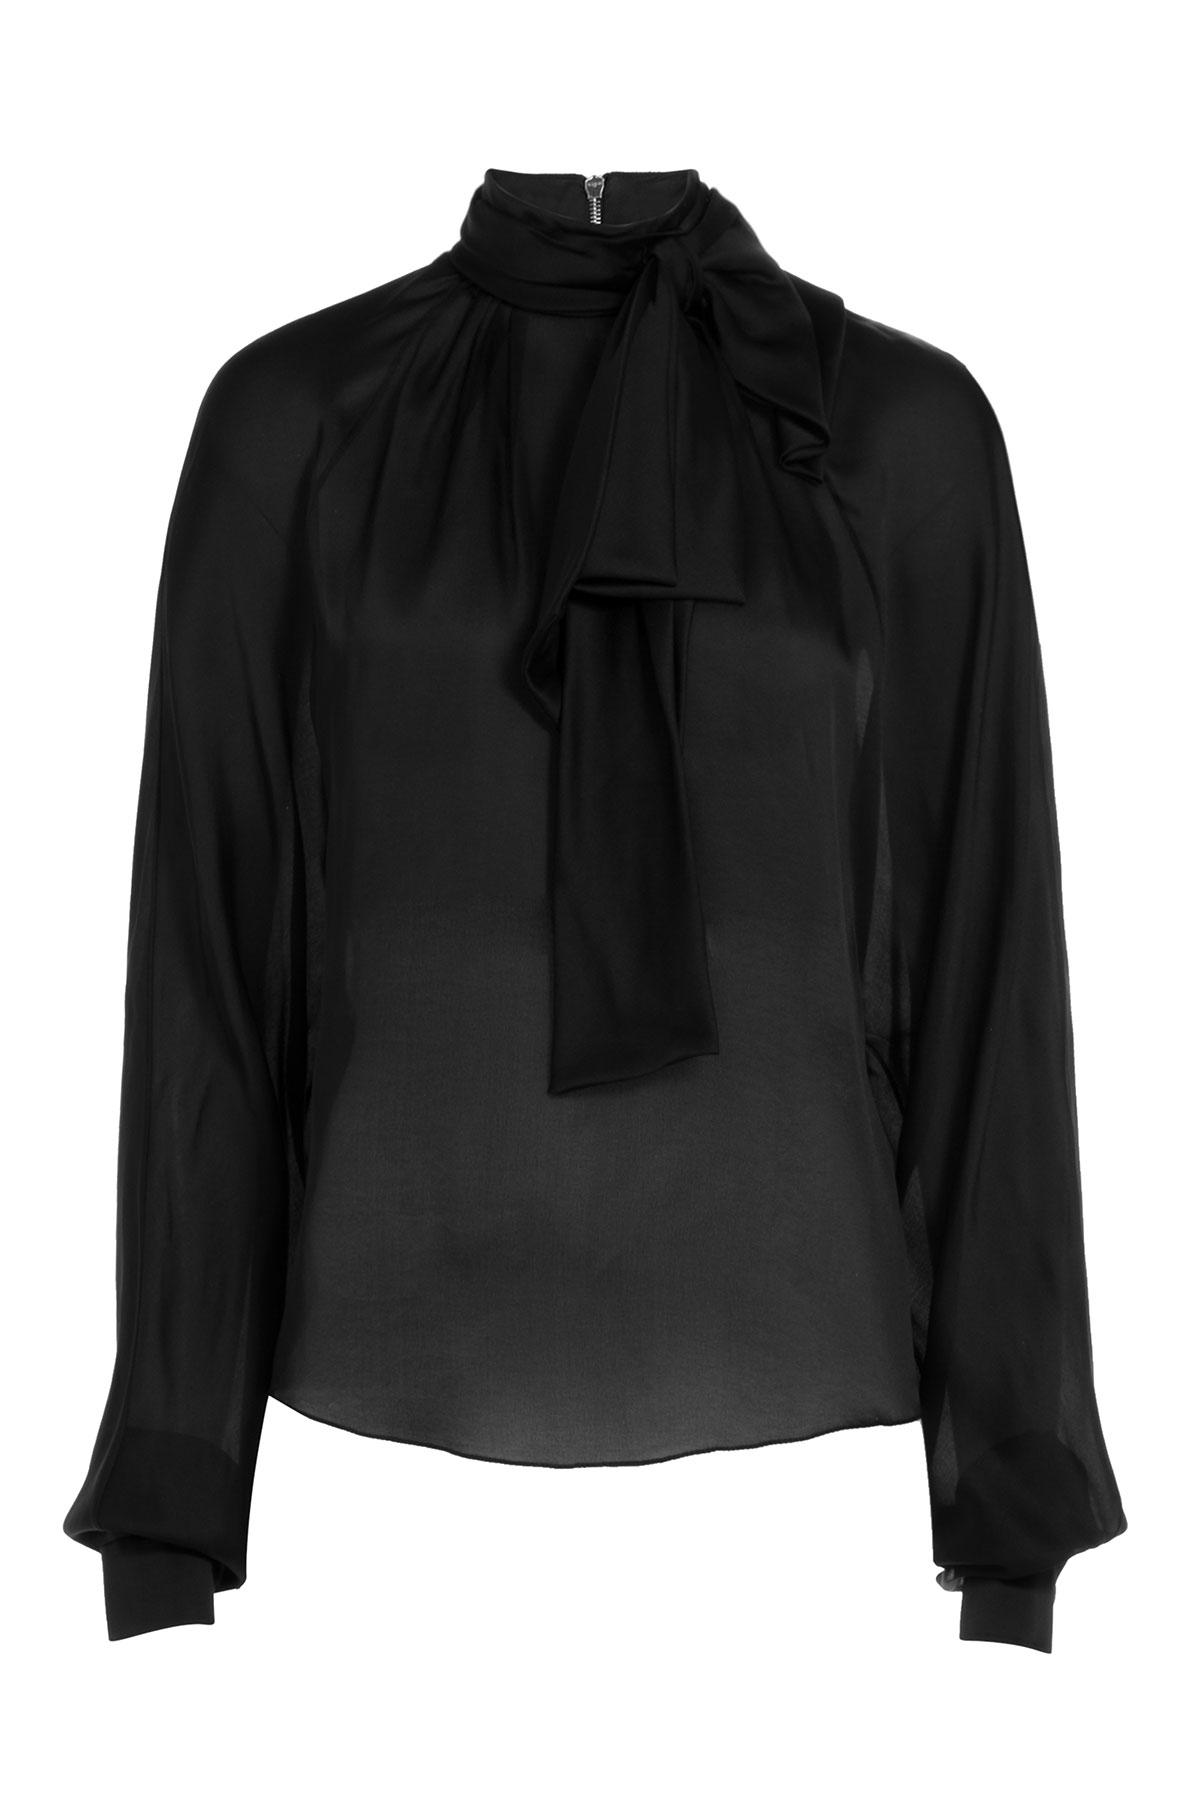 Balmain Tie-neck Silk Blouse - Black in Black   Lyst